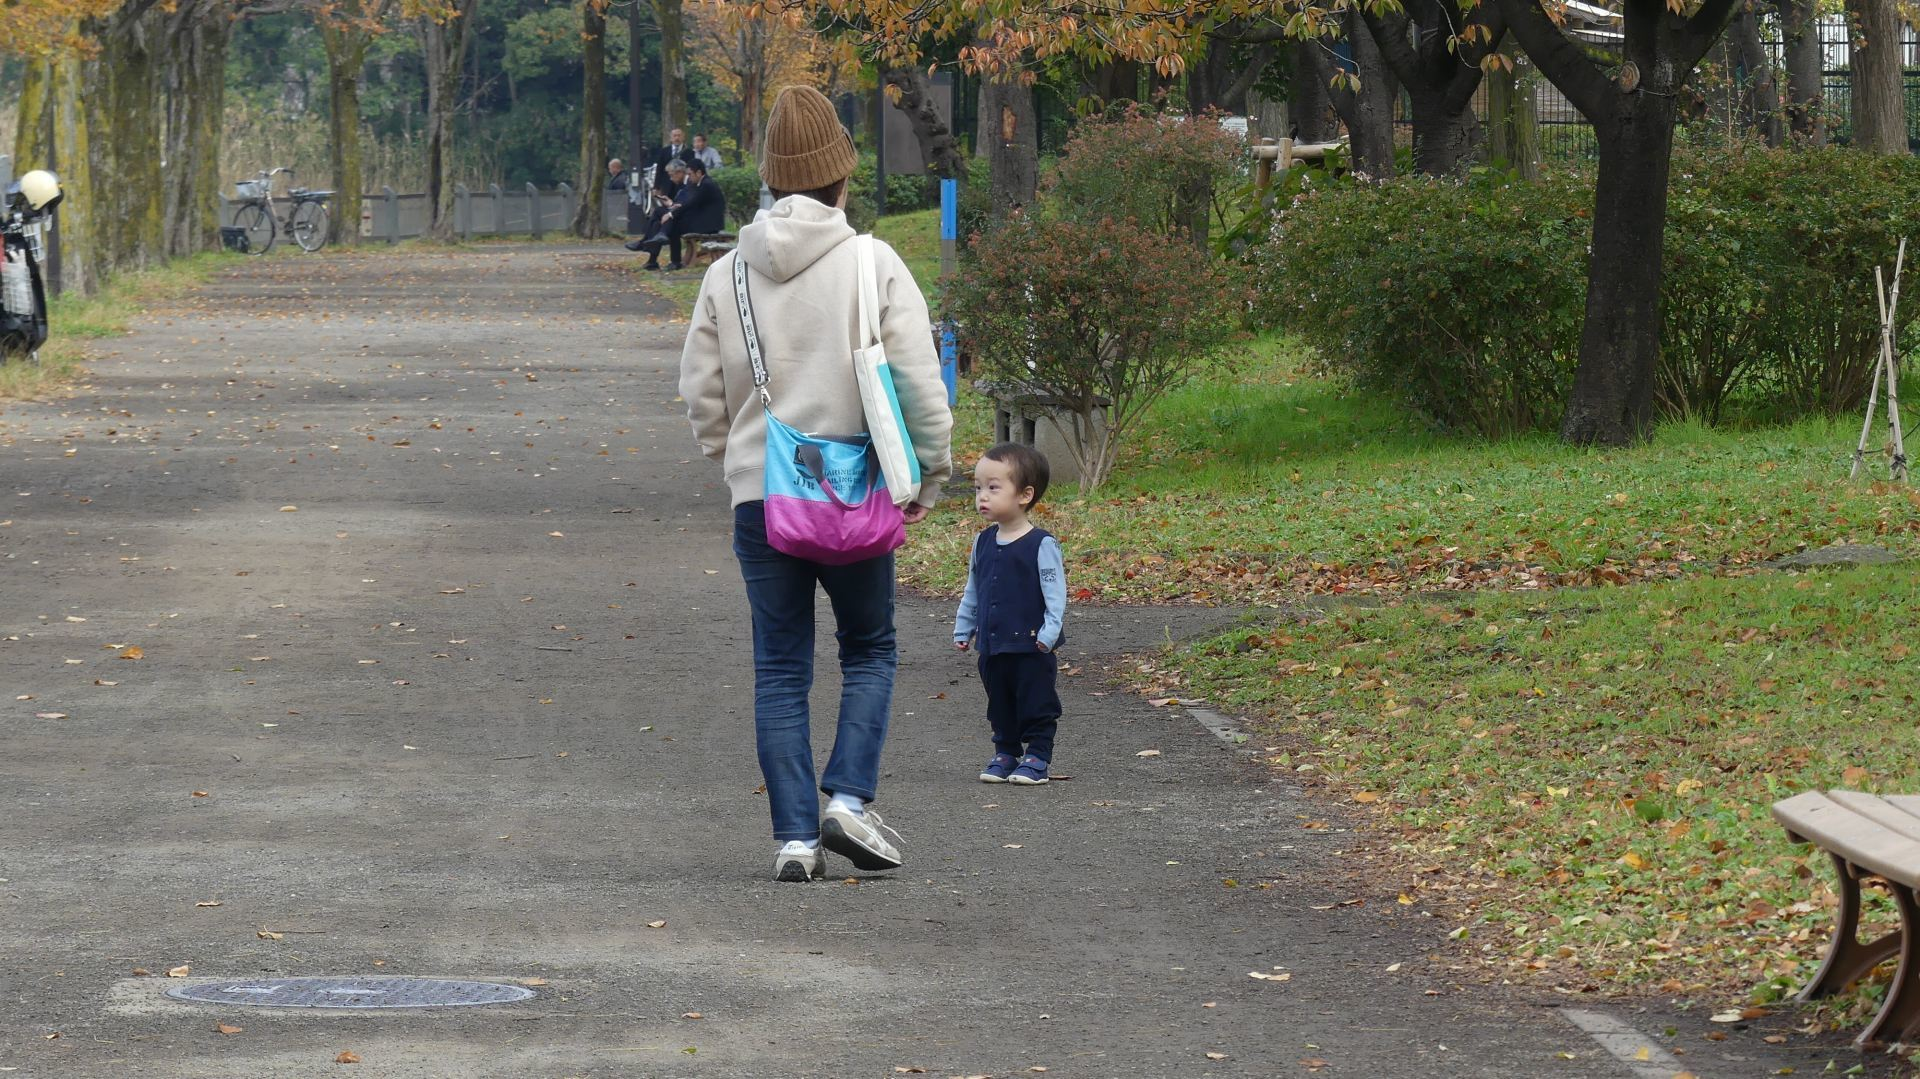 秋色の散歩道_a0185081_23072323.jpg